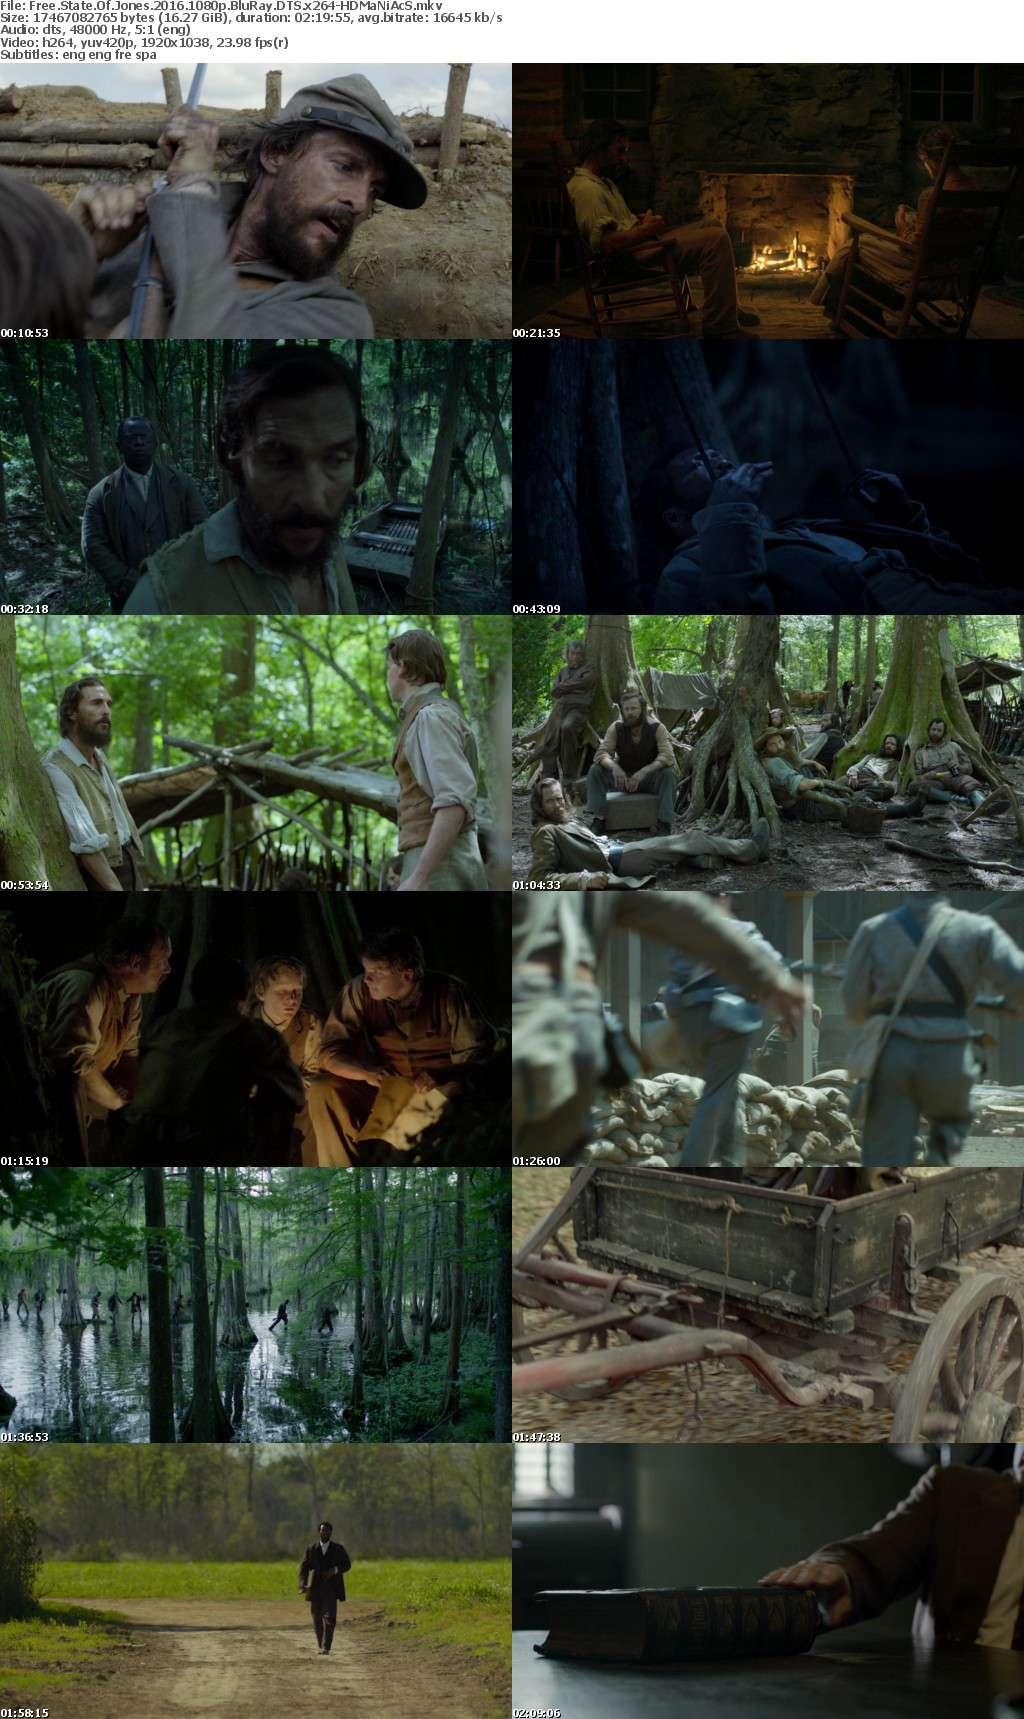 Free State Of Jones 2016 1080p BluRay DTS x264-HDMaNiAcS